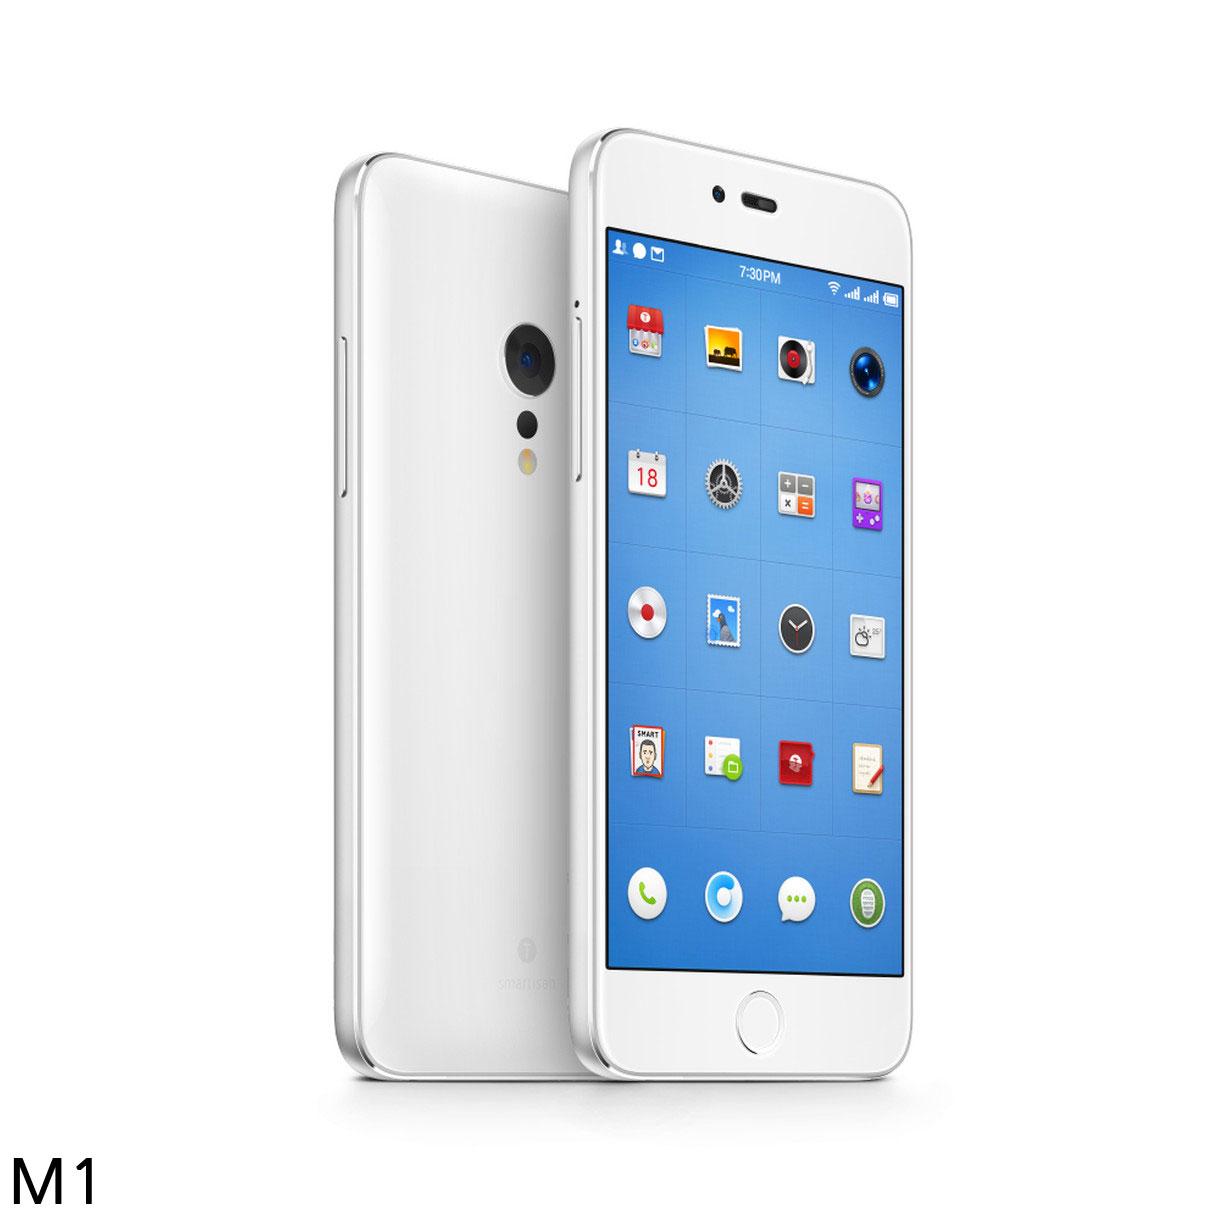 M1_M1L_09.jpg